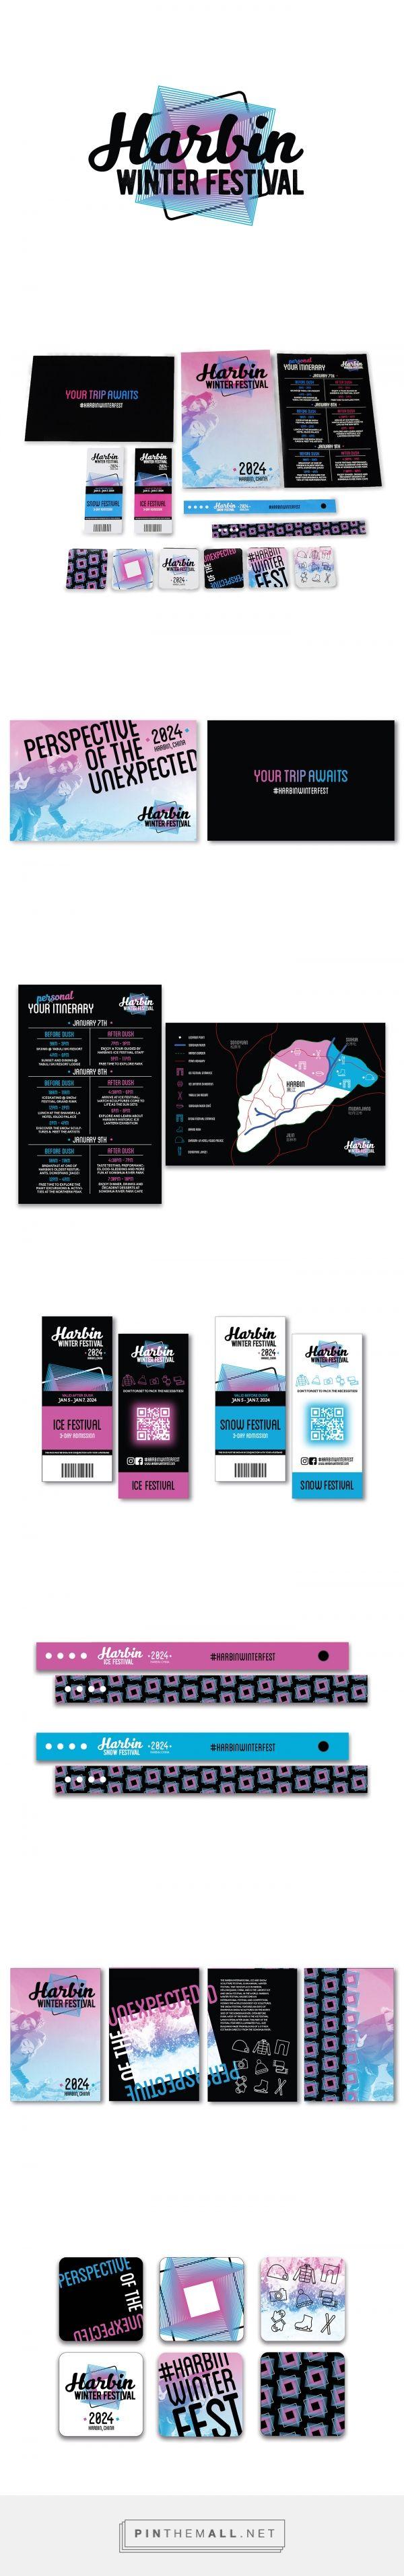 Harbin Winter Festival Event Branding by Lindsay Petschauer | Fivestar Branding Agency – Design and Branding Agency & Curated Inspiration Gallery